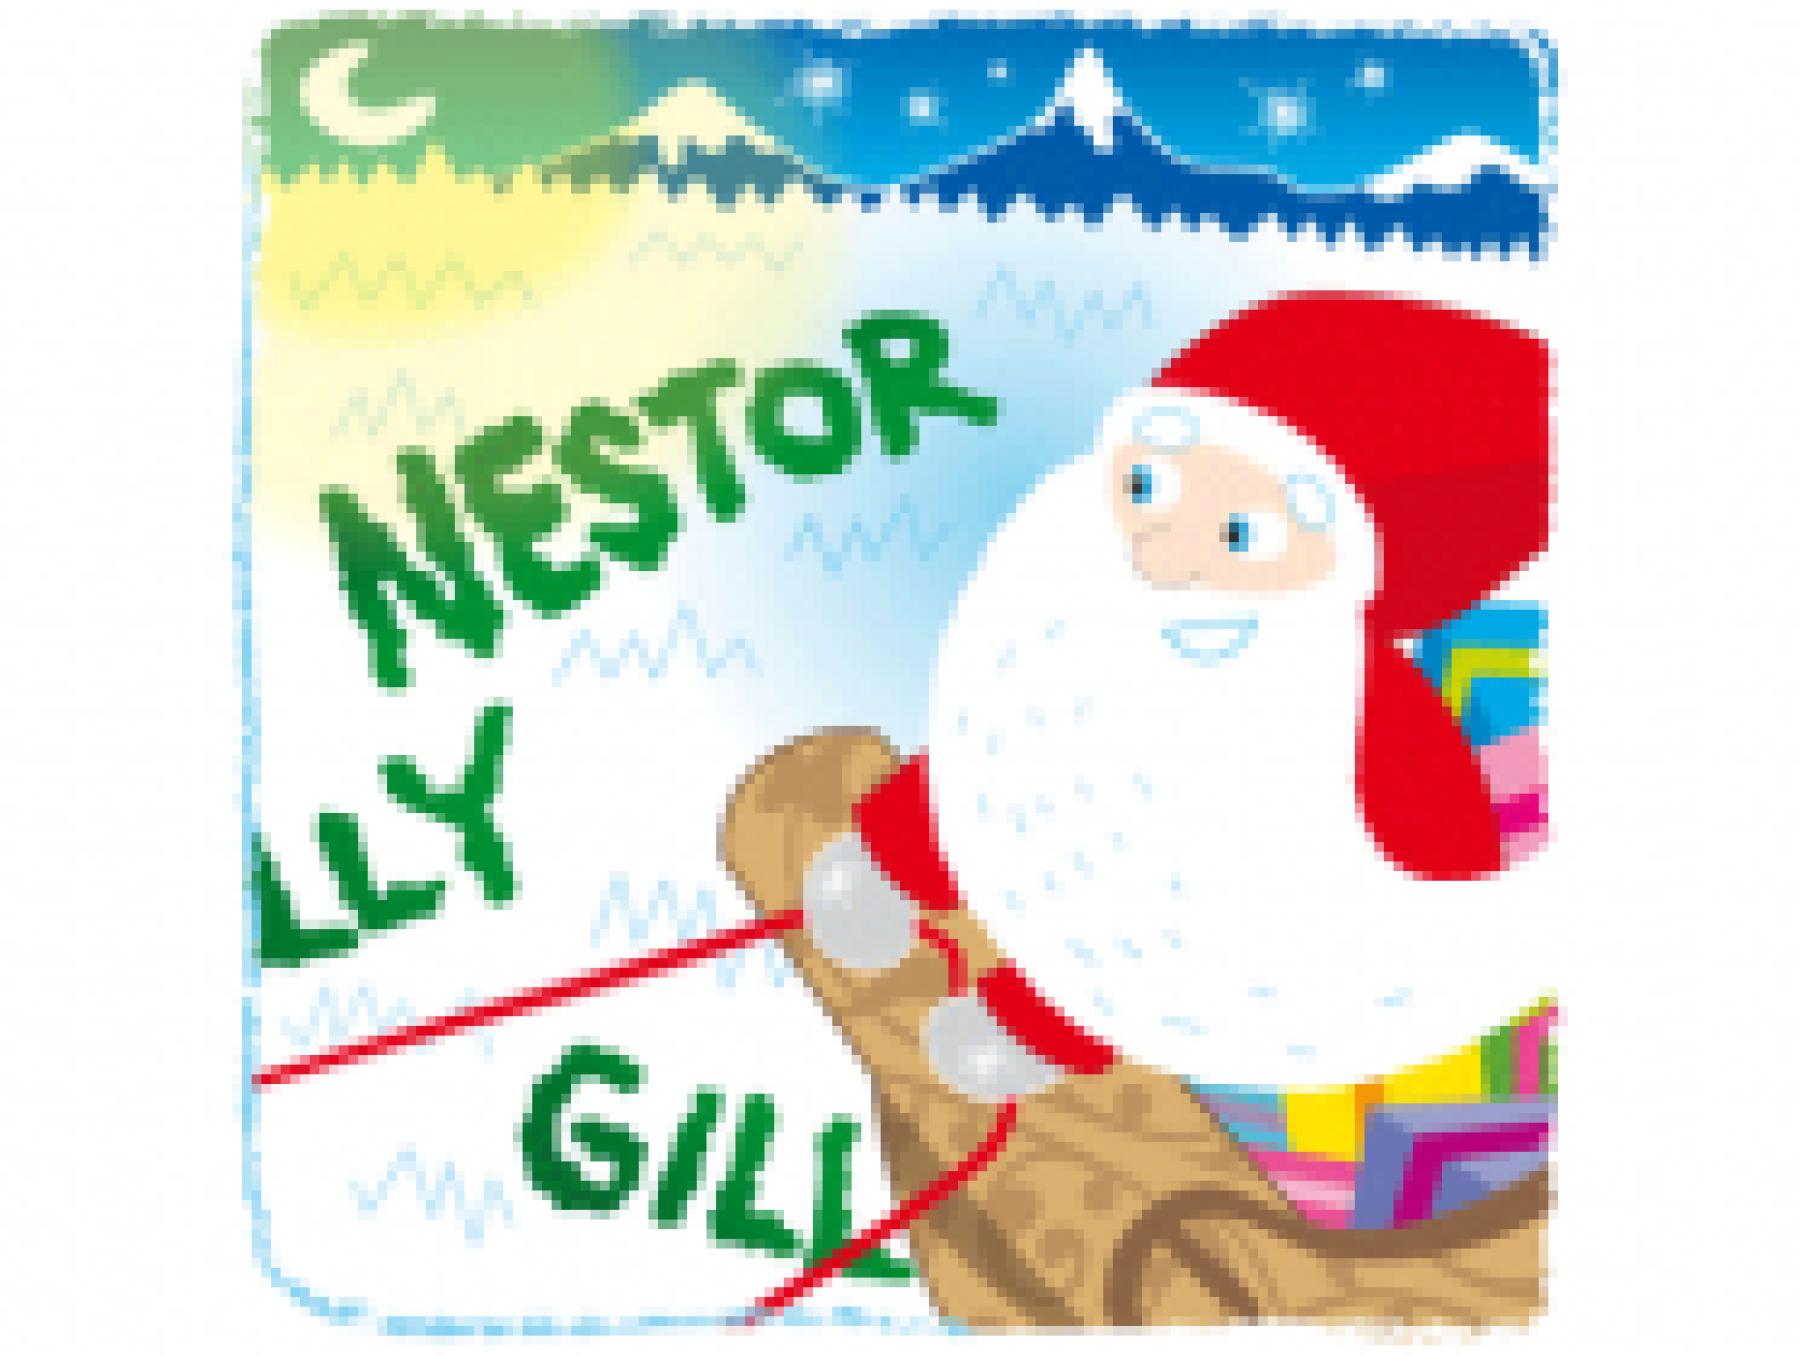 Le Noël de Nestor le castor